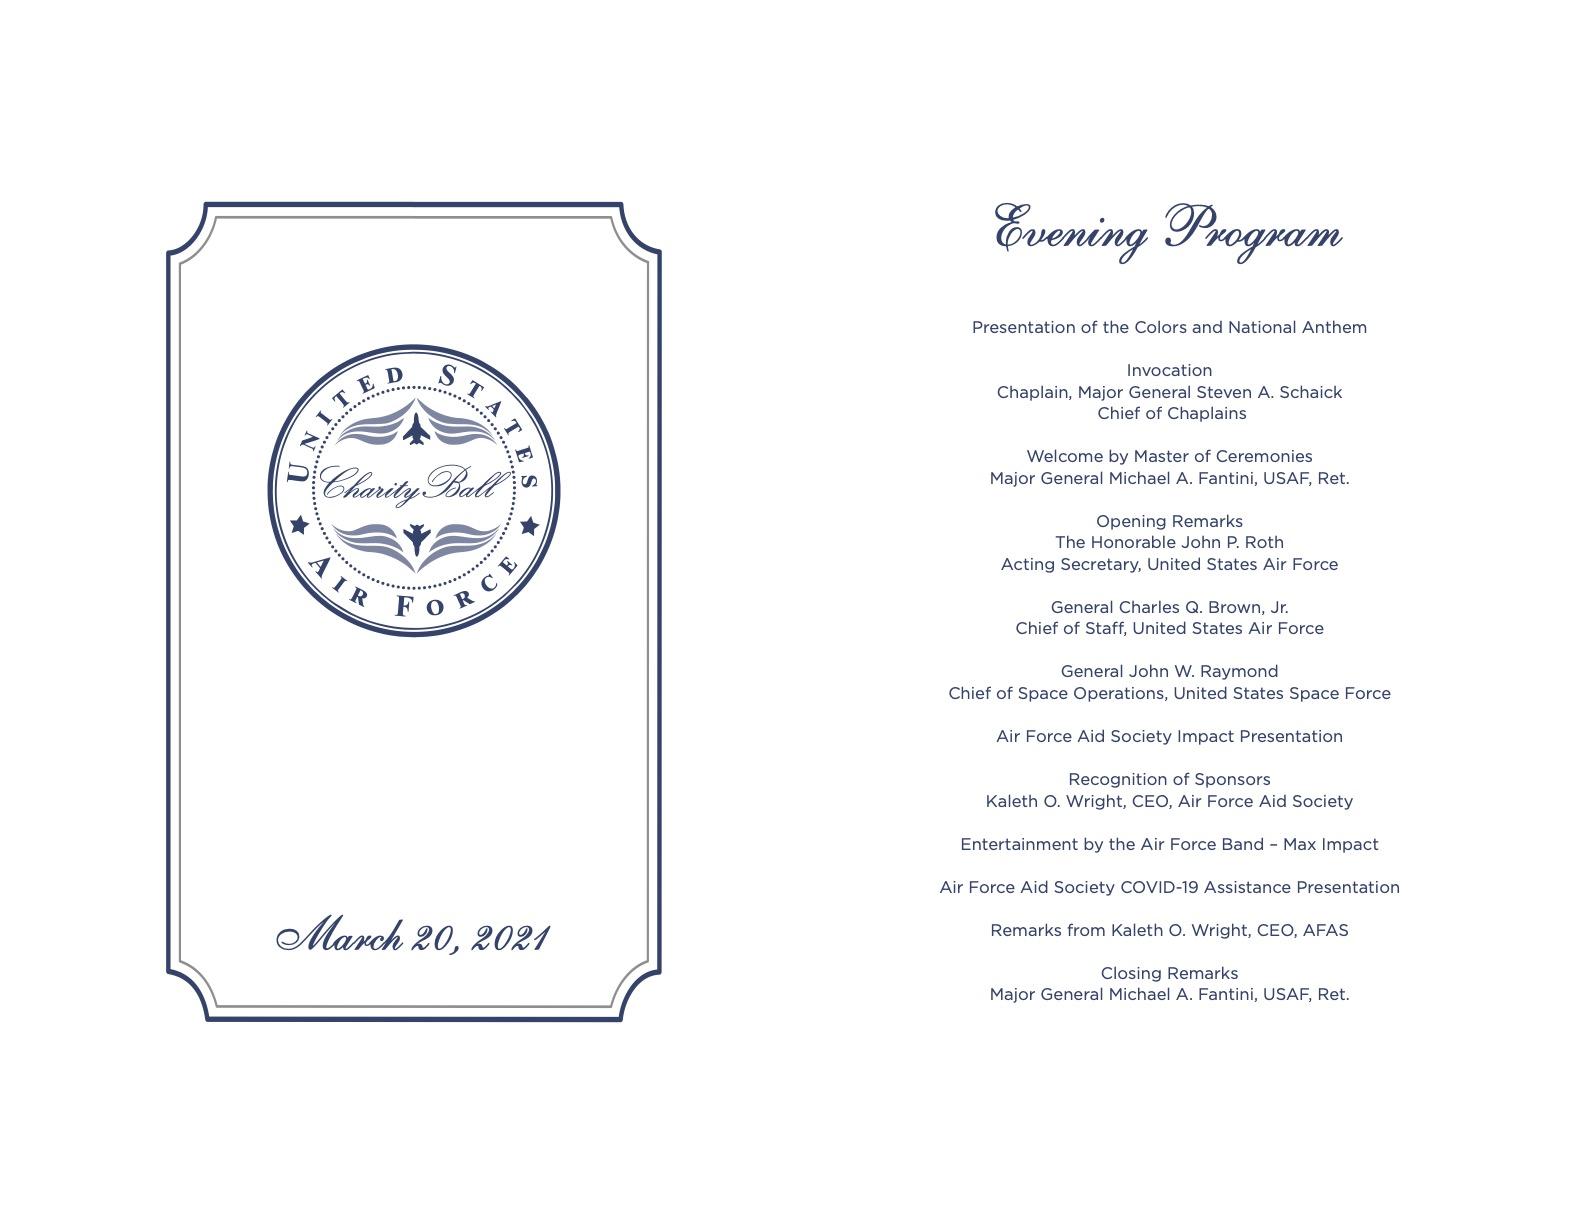 2021 Air Force Charity Program